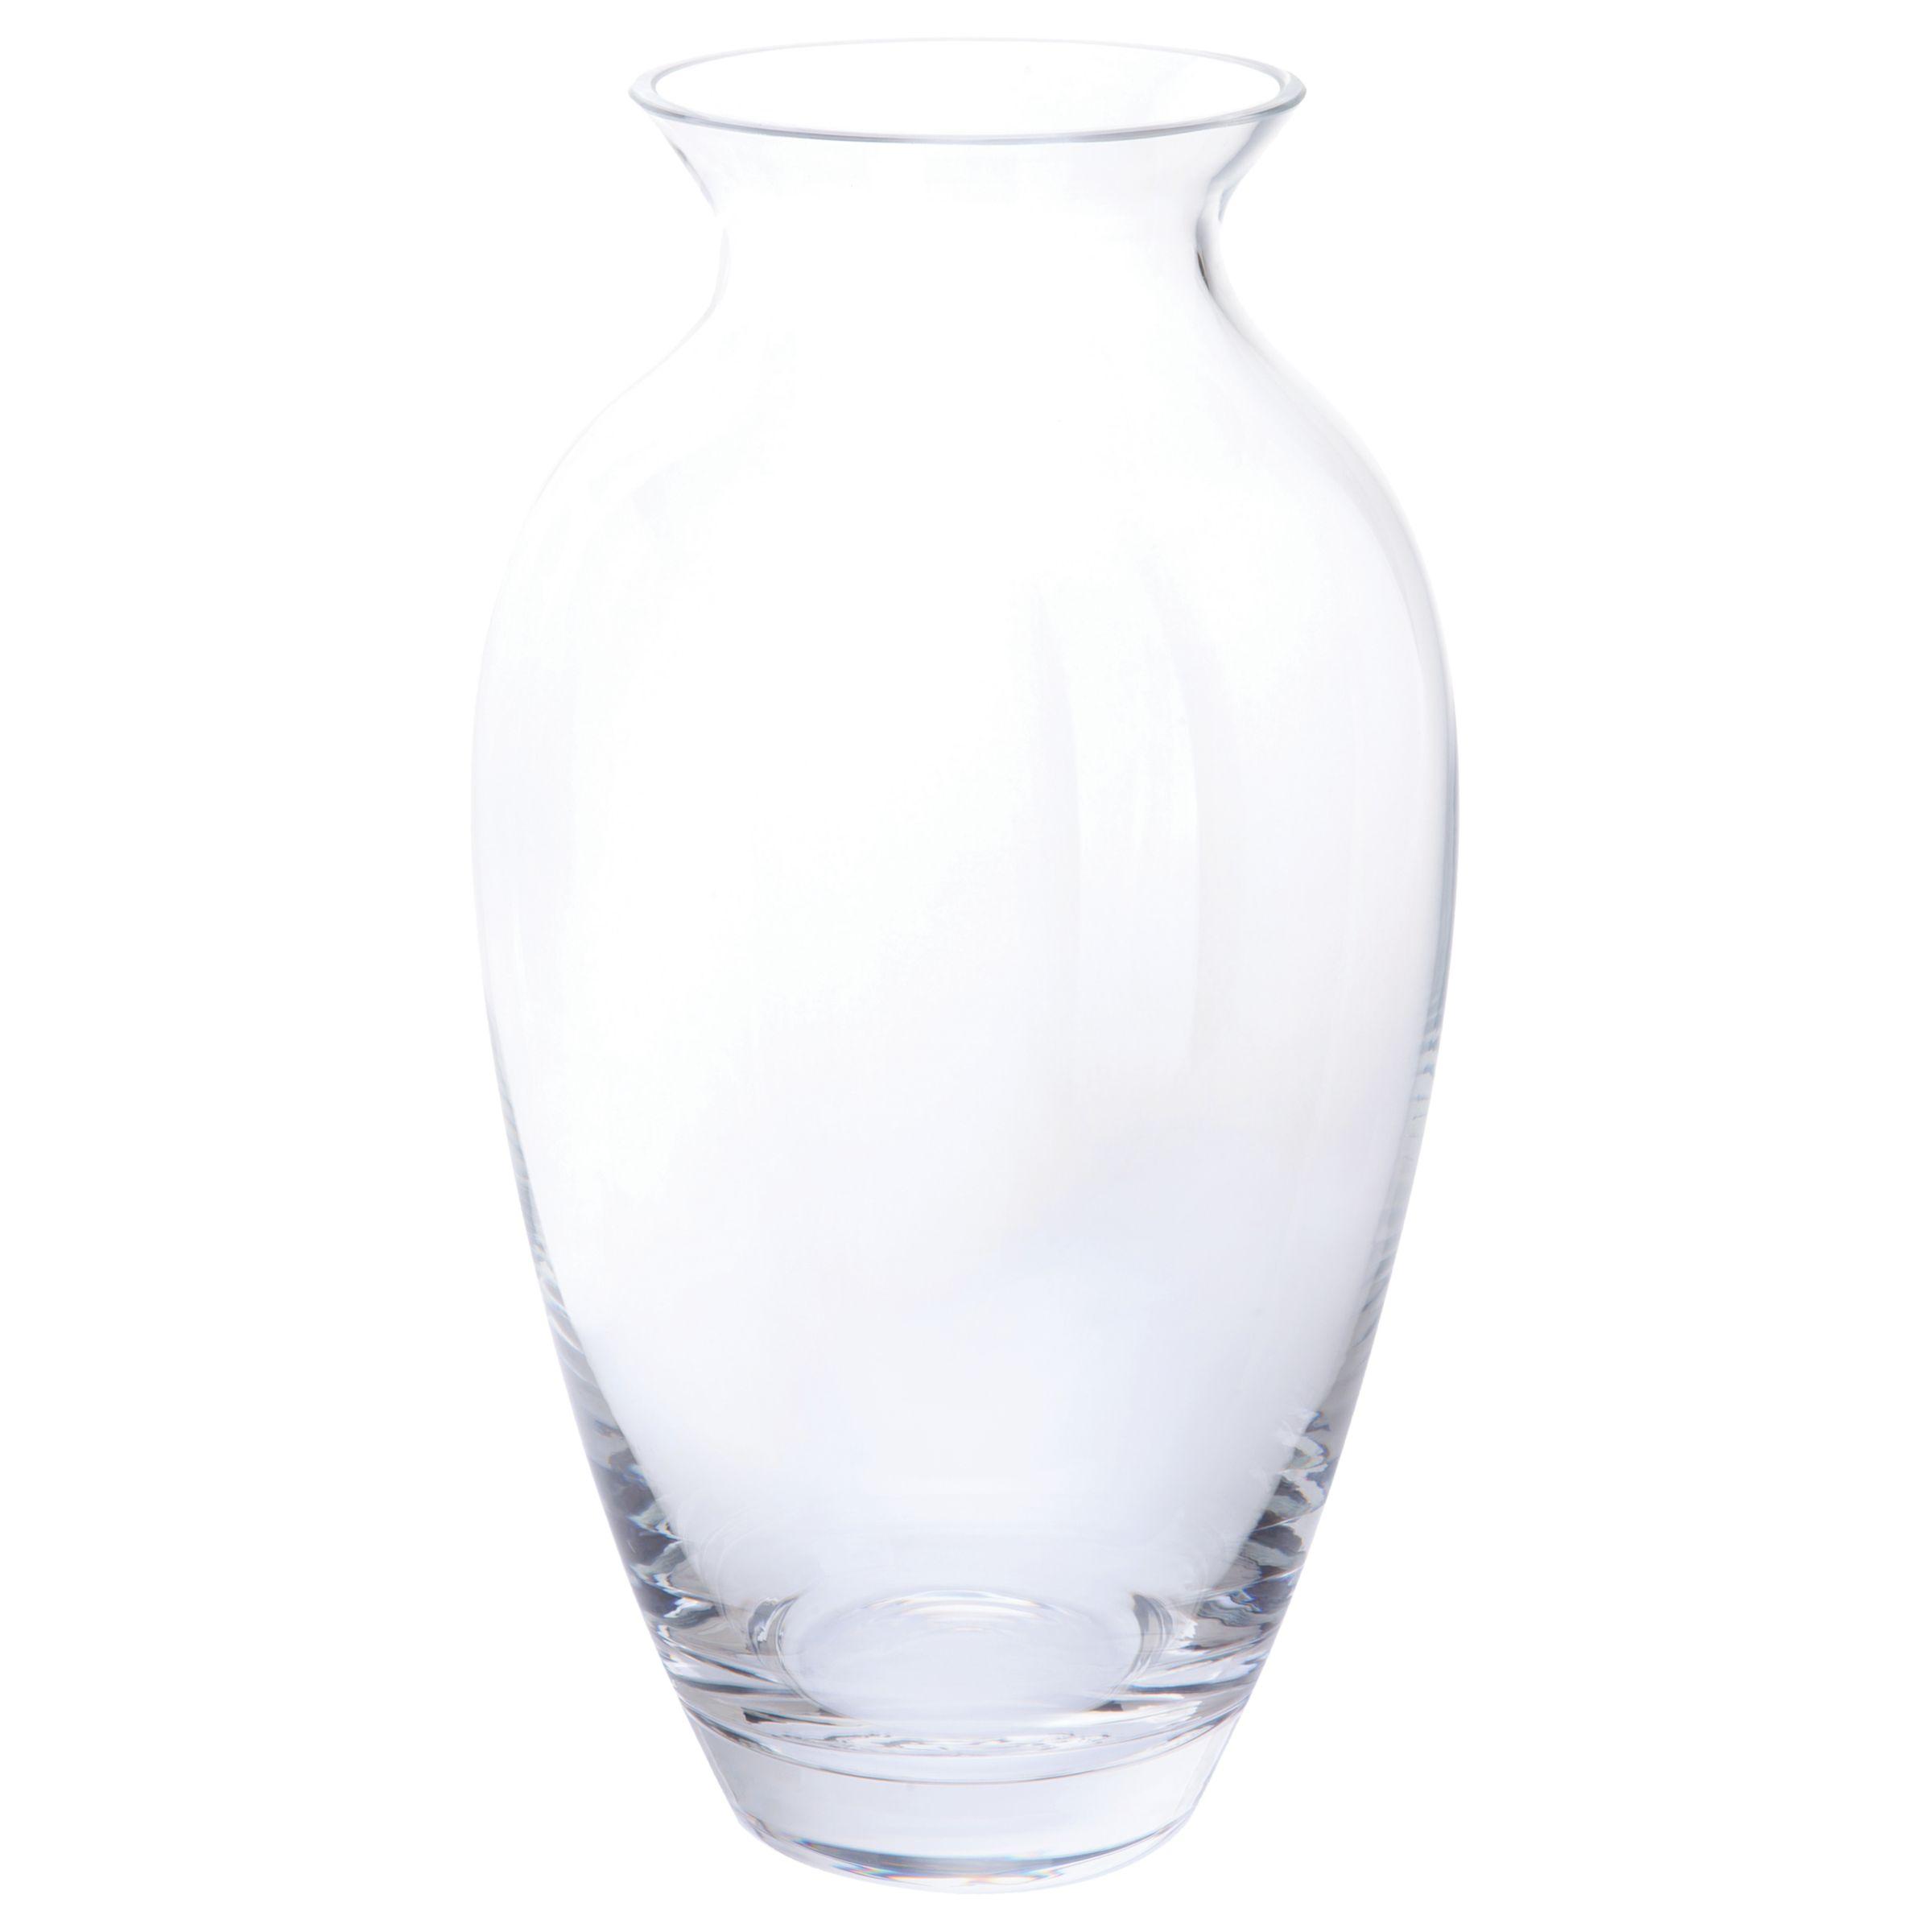 Dartington Crystal Dartington Crystal Tara Medium Vase, Clear